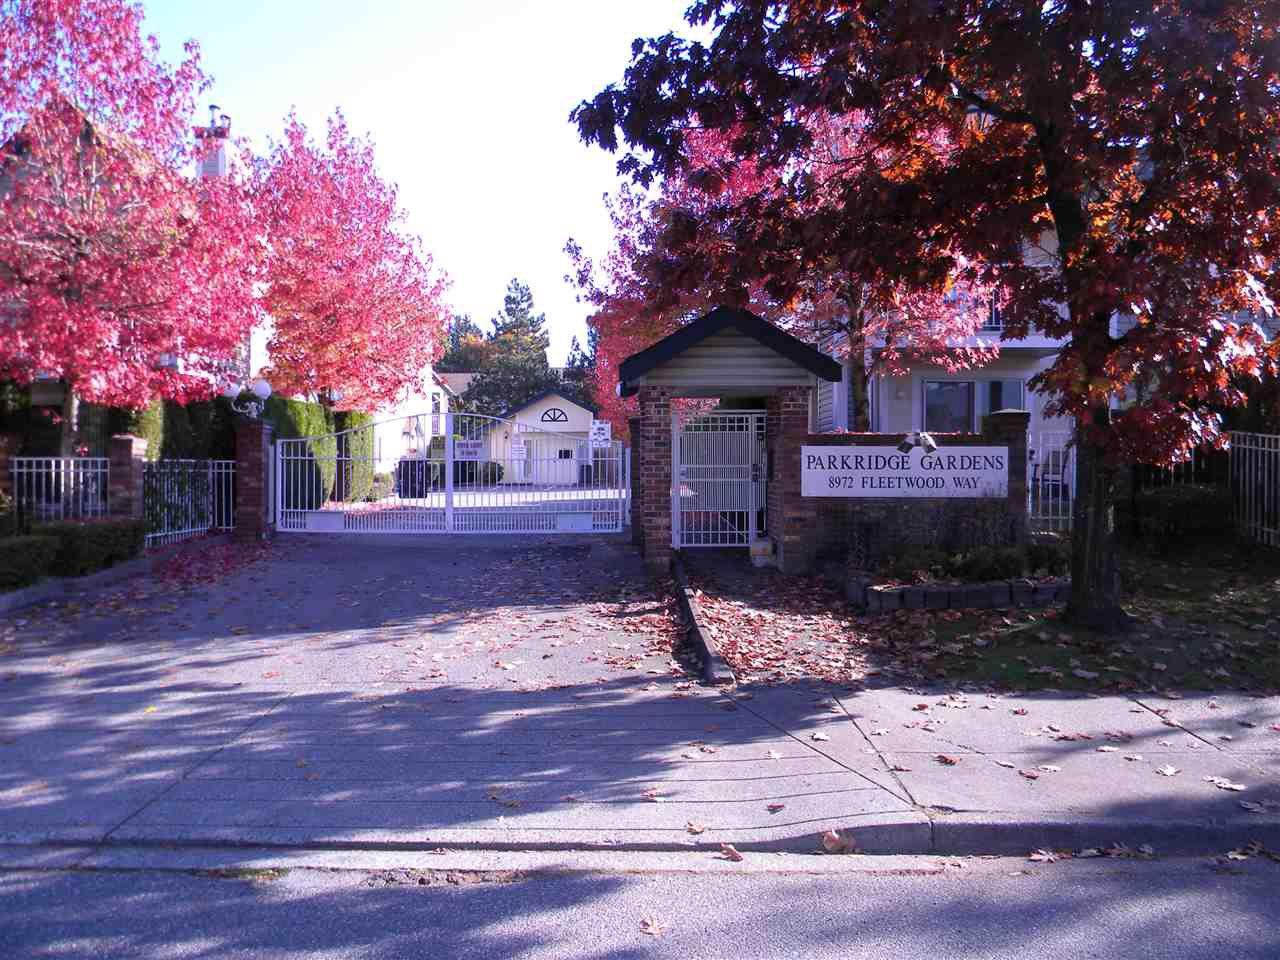 "Main Photo: 801 8972 FLEETWOOD Way in Surrey: Fleetwood Tynehead Townhouse for sale in ""Parkridge Gardens"" : MLS®# R2338897"